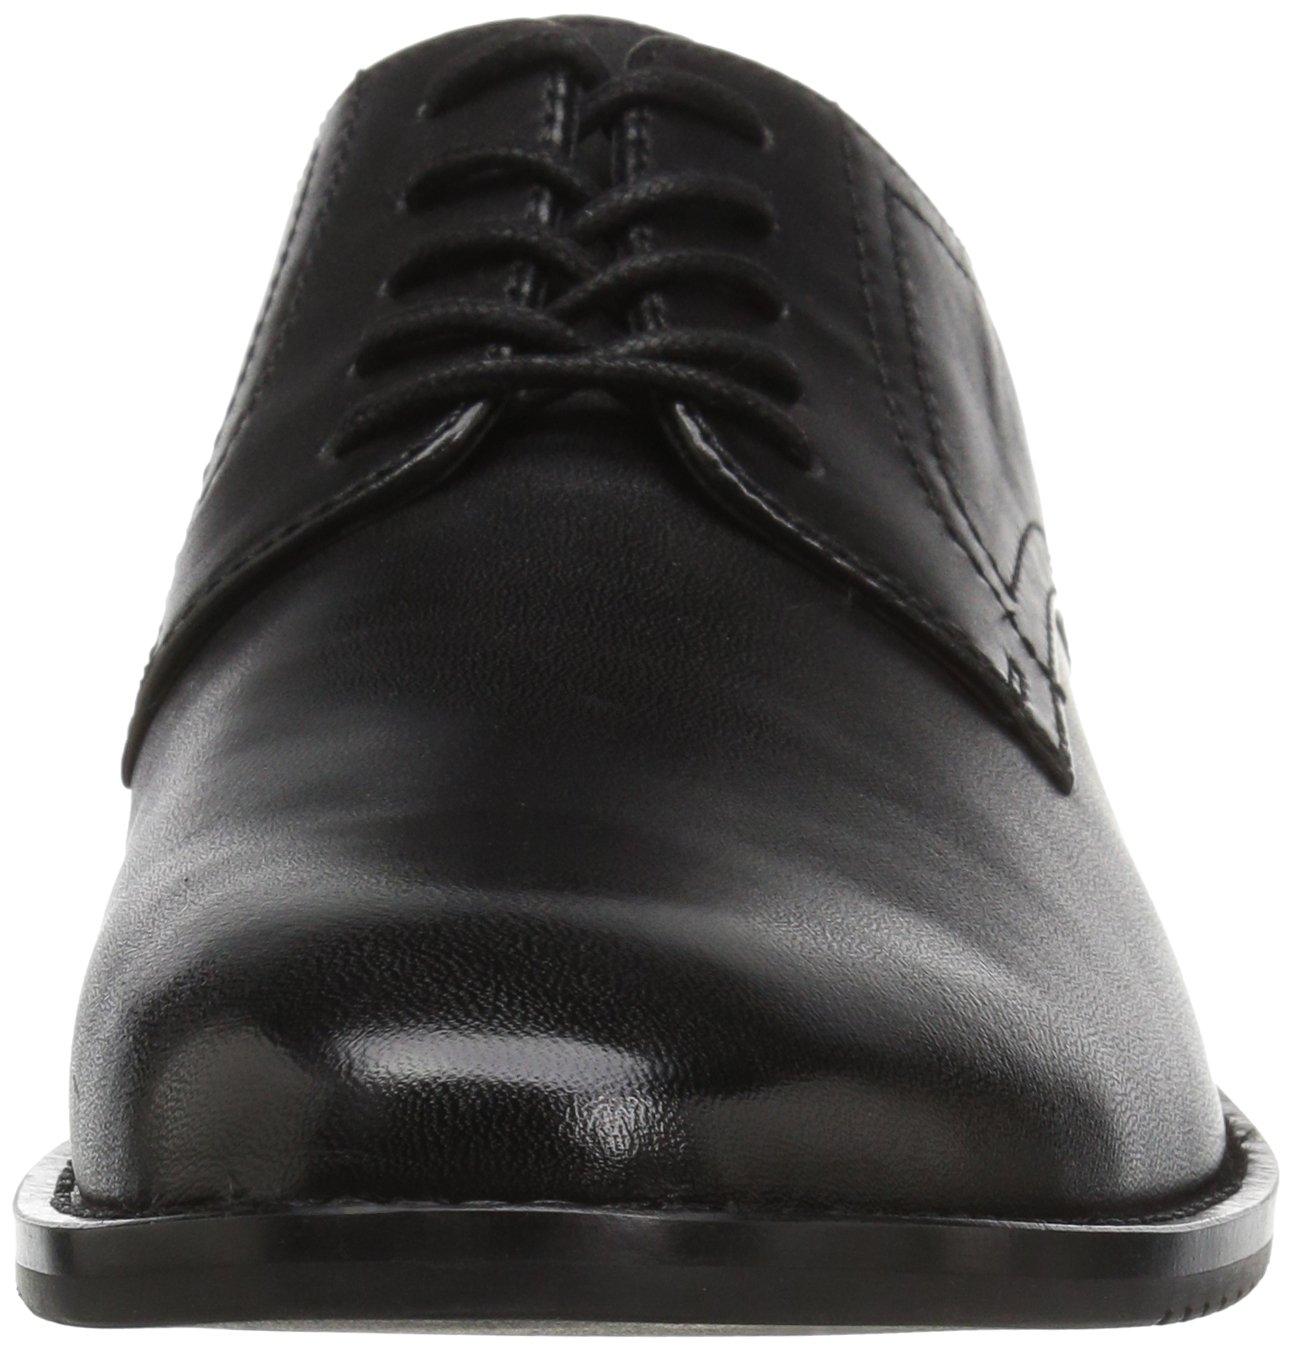 206 Collective Men's Concord Plain-Toe Oxford Shoe, Black, 13 2E US by 206 Collective (Image #4)